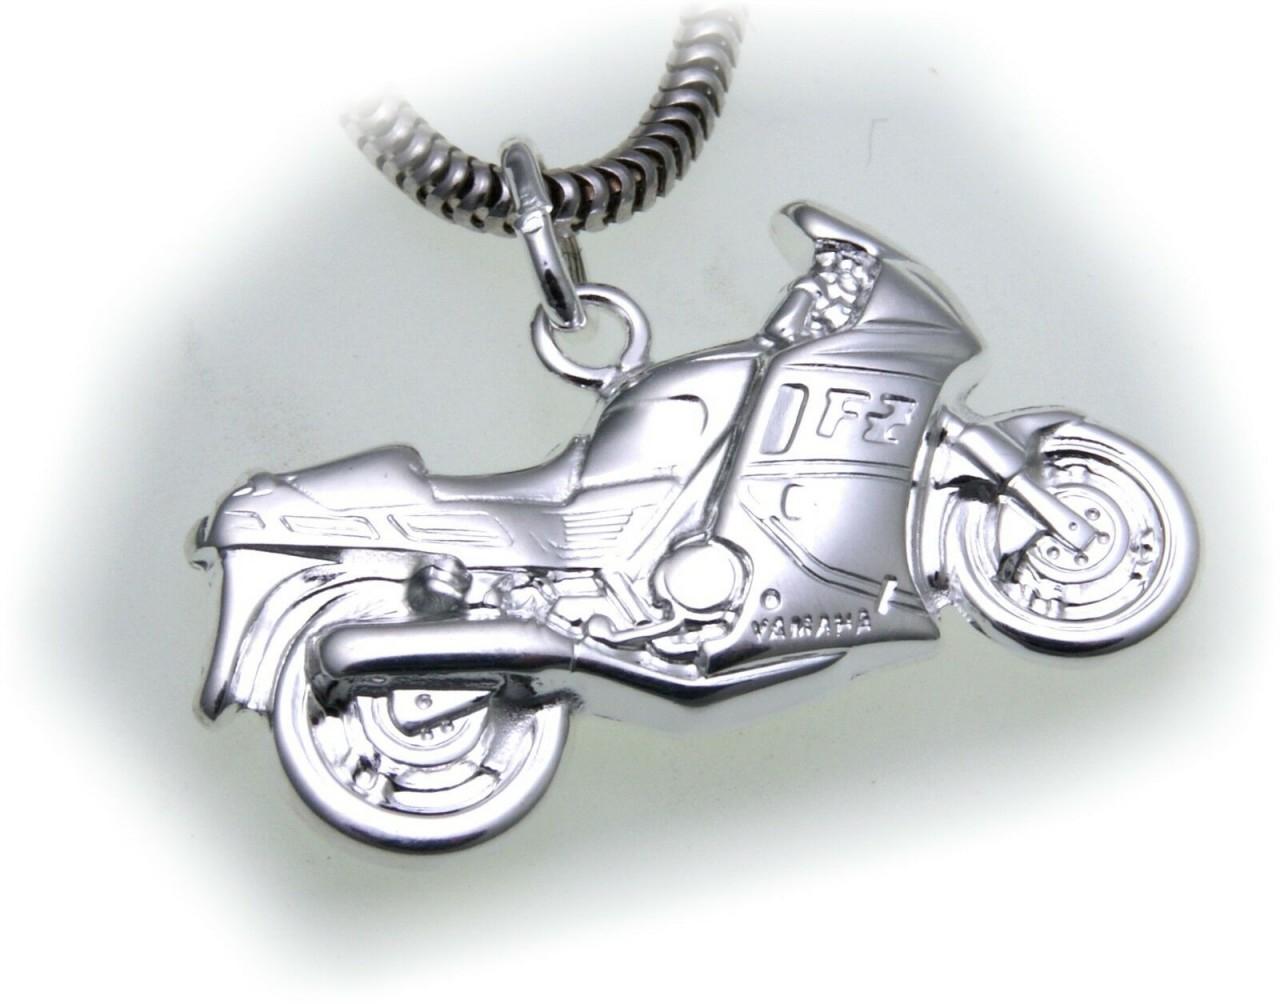 Anhänger Motorrad detailgetreu echt Silber 925 Moped Sterlingsilber Unisex